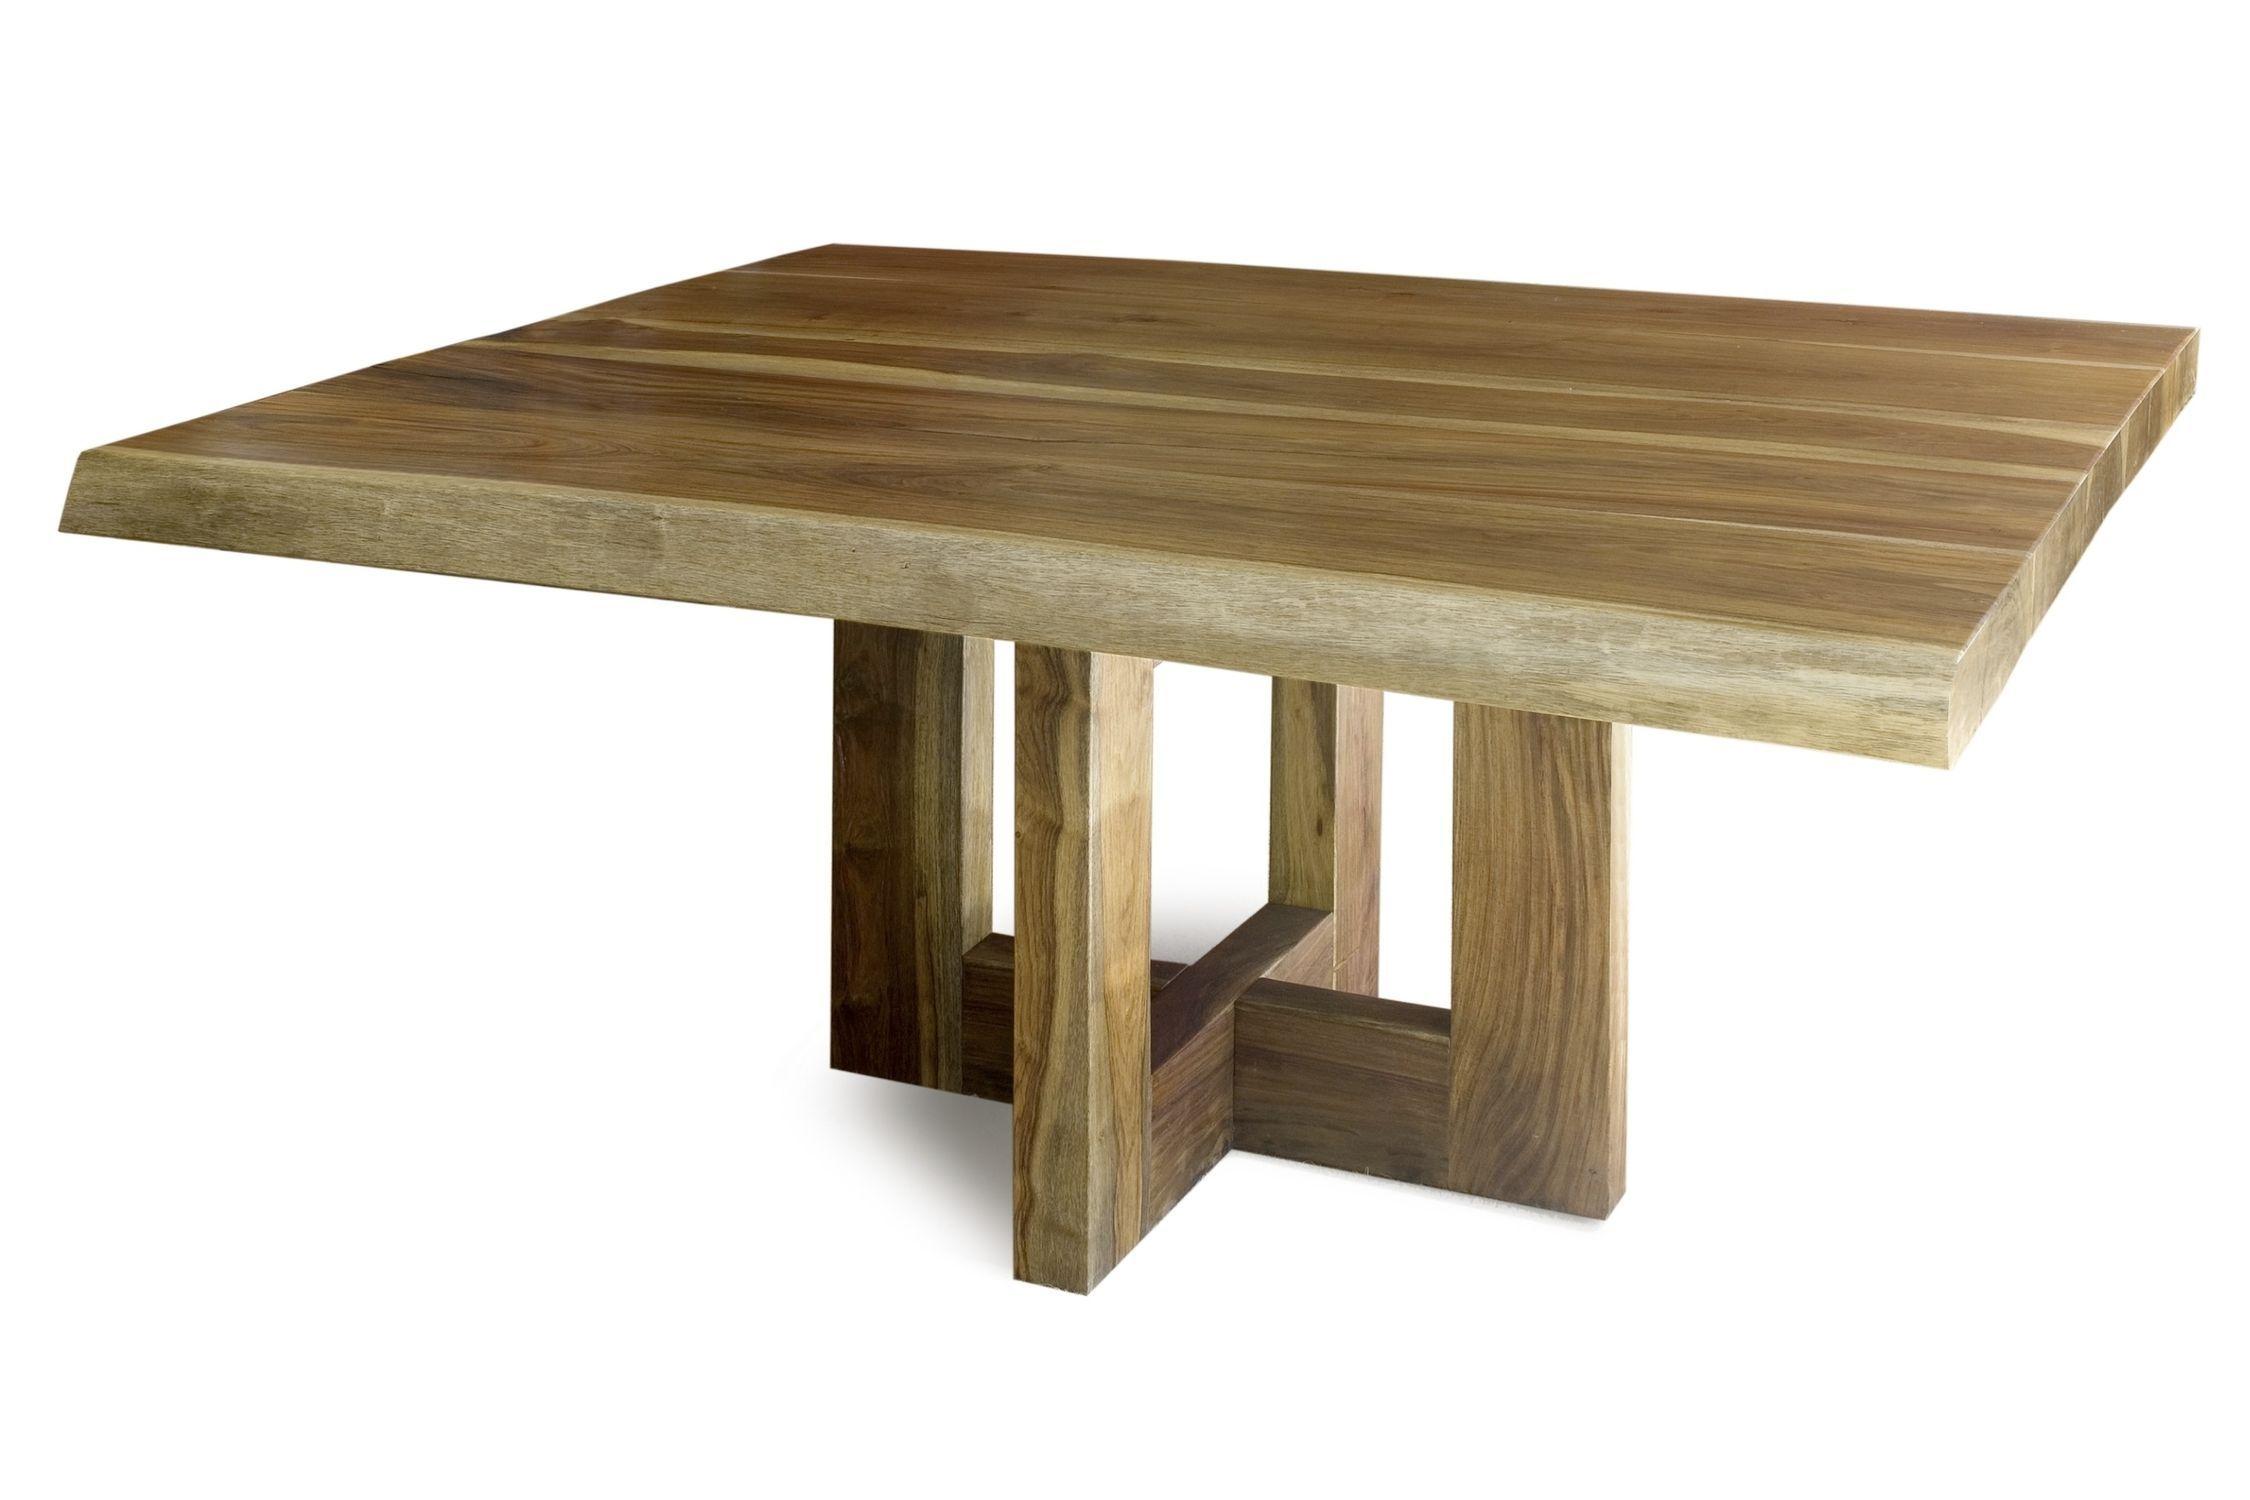 modern wood coffee table designs photo - 8